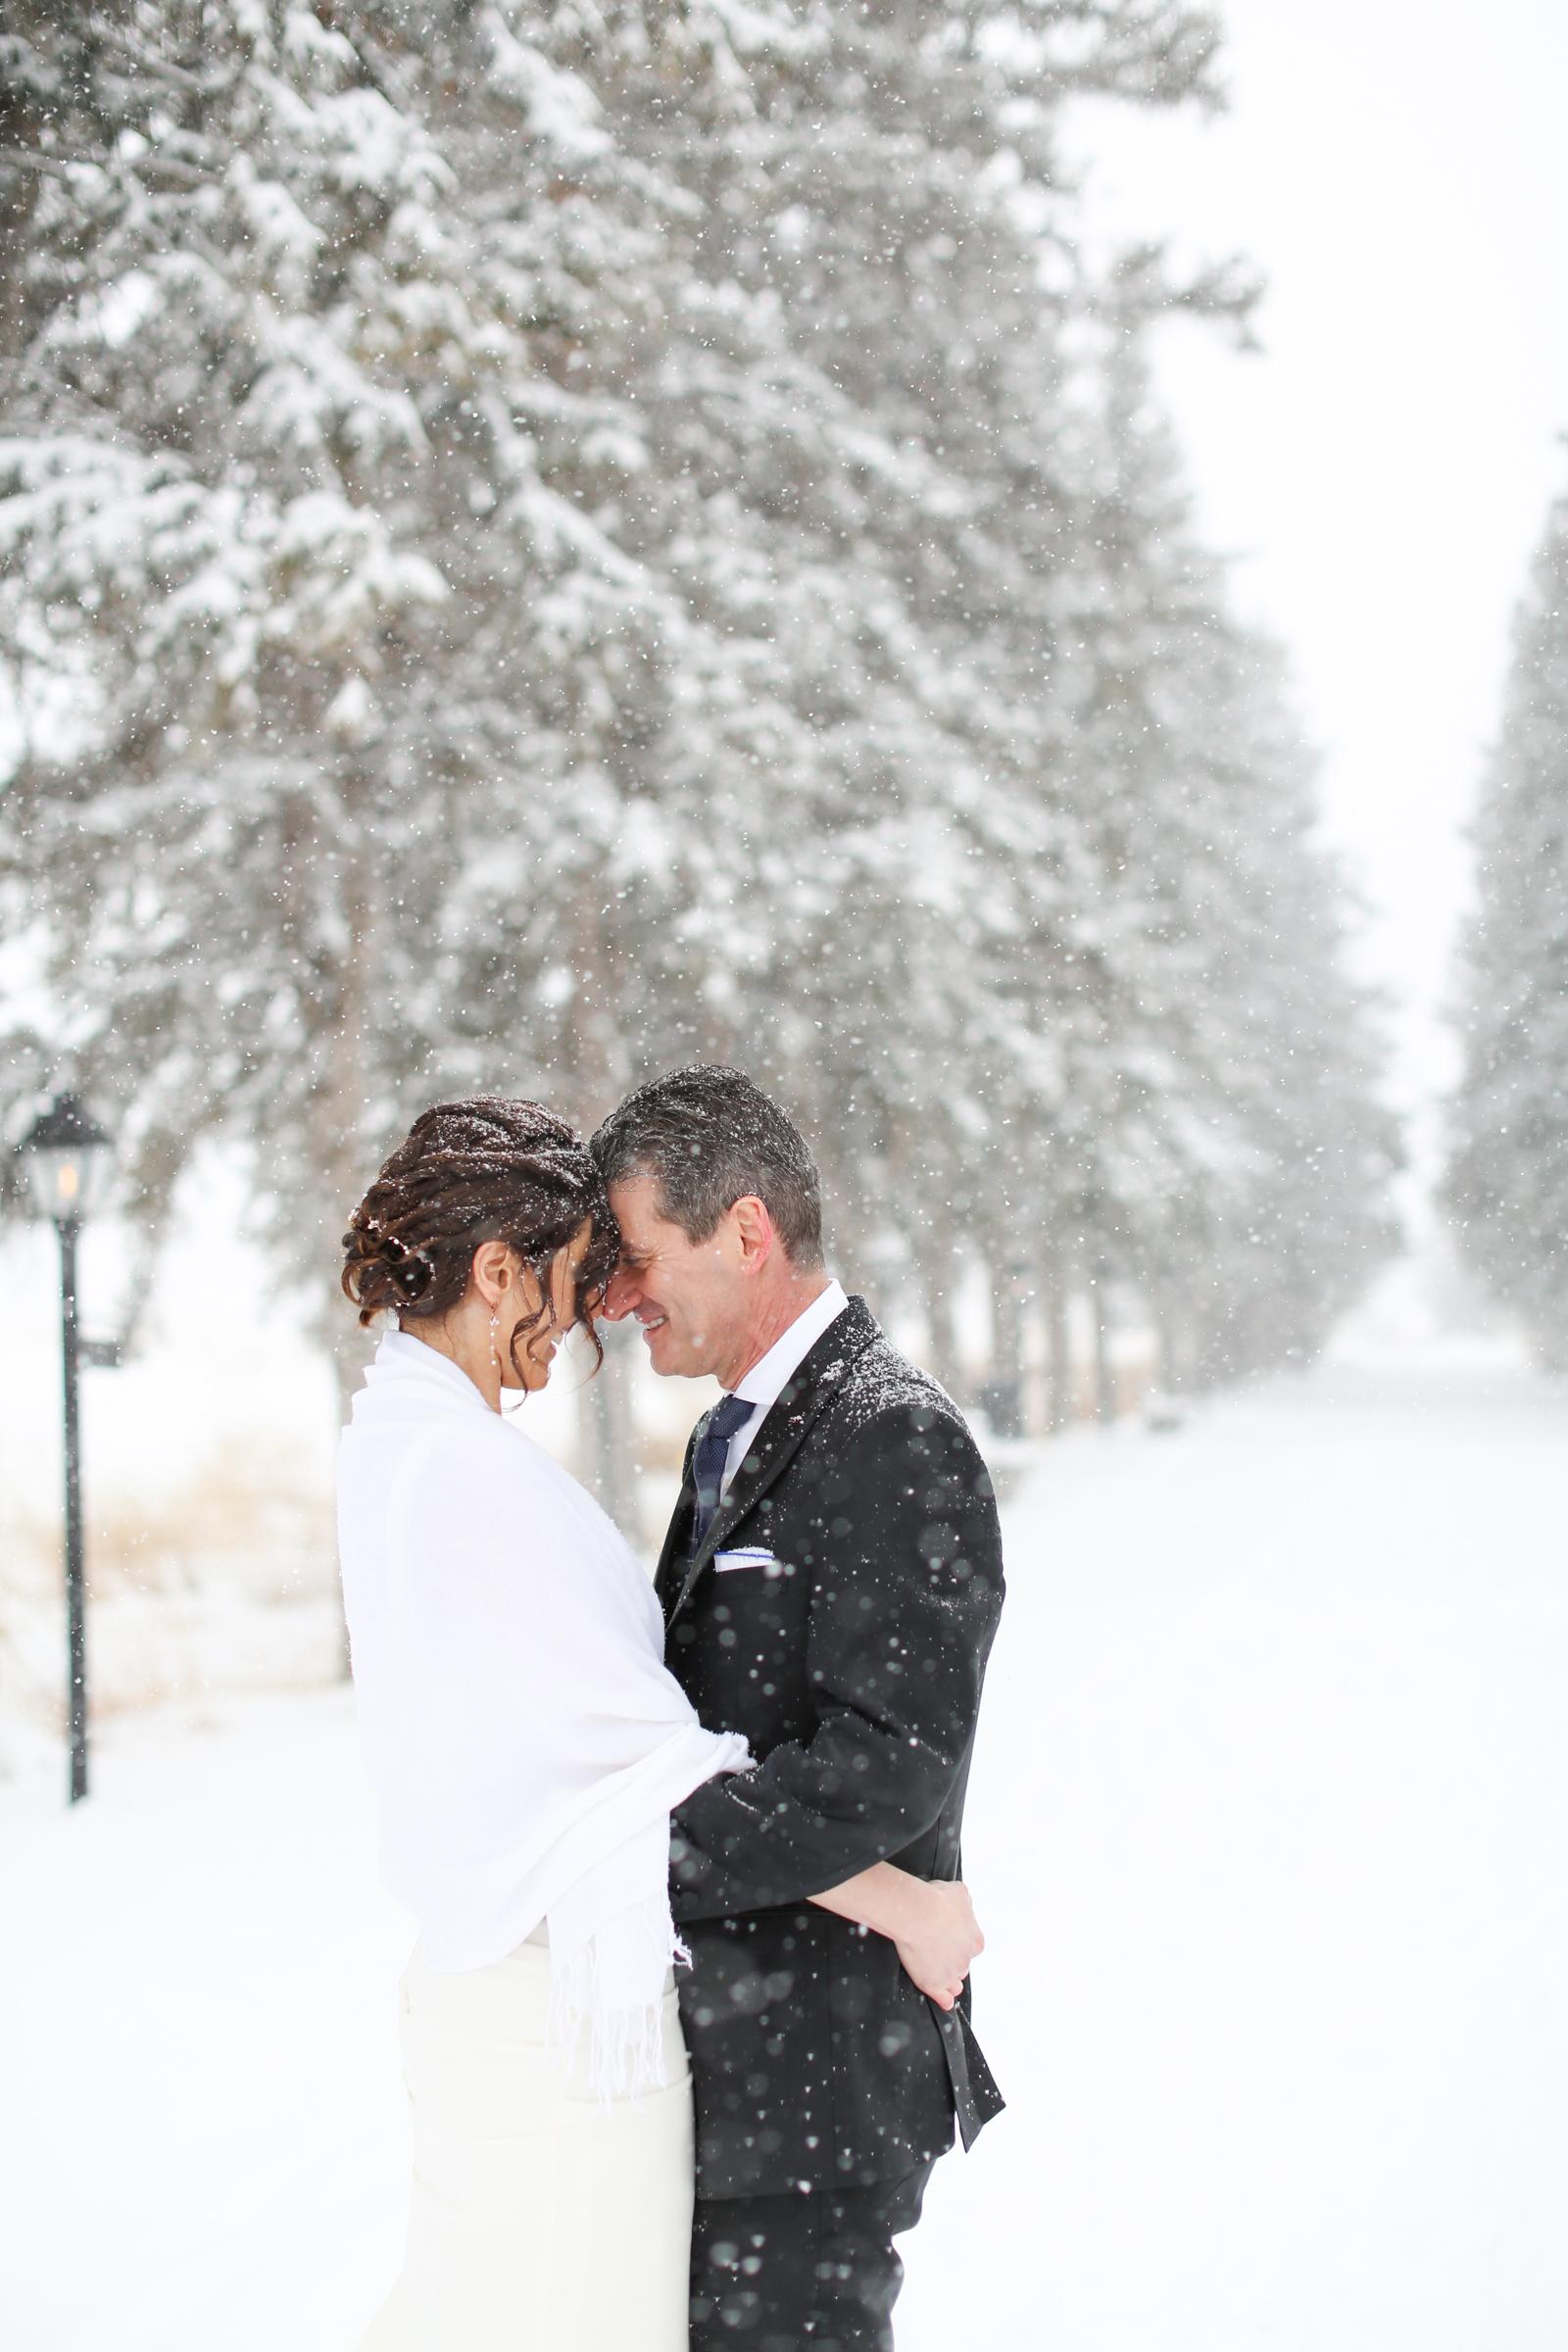 Melanie+Vince-Wedding-41.jpg